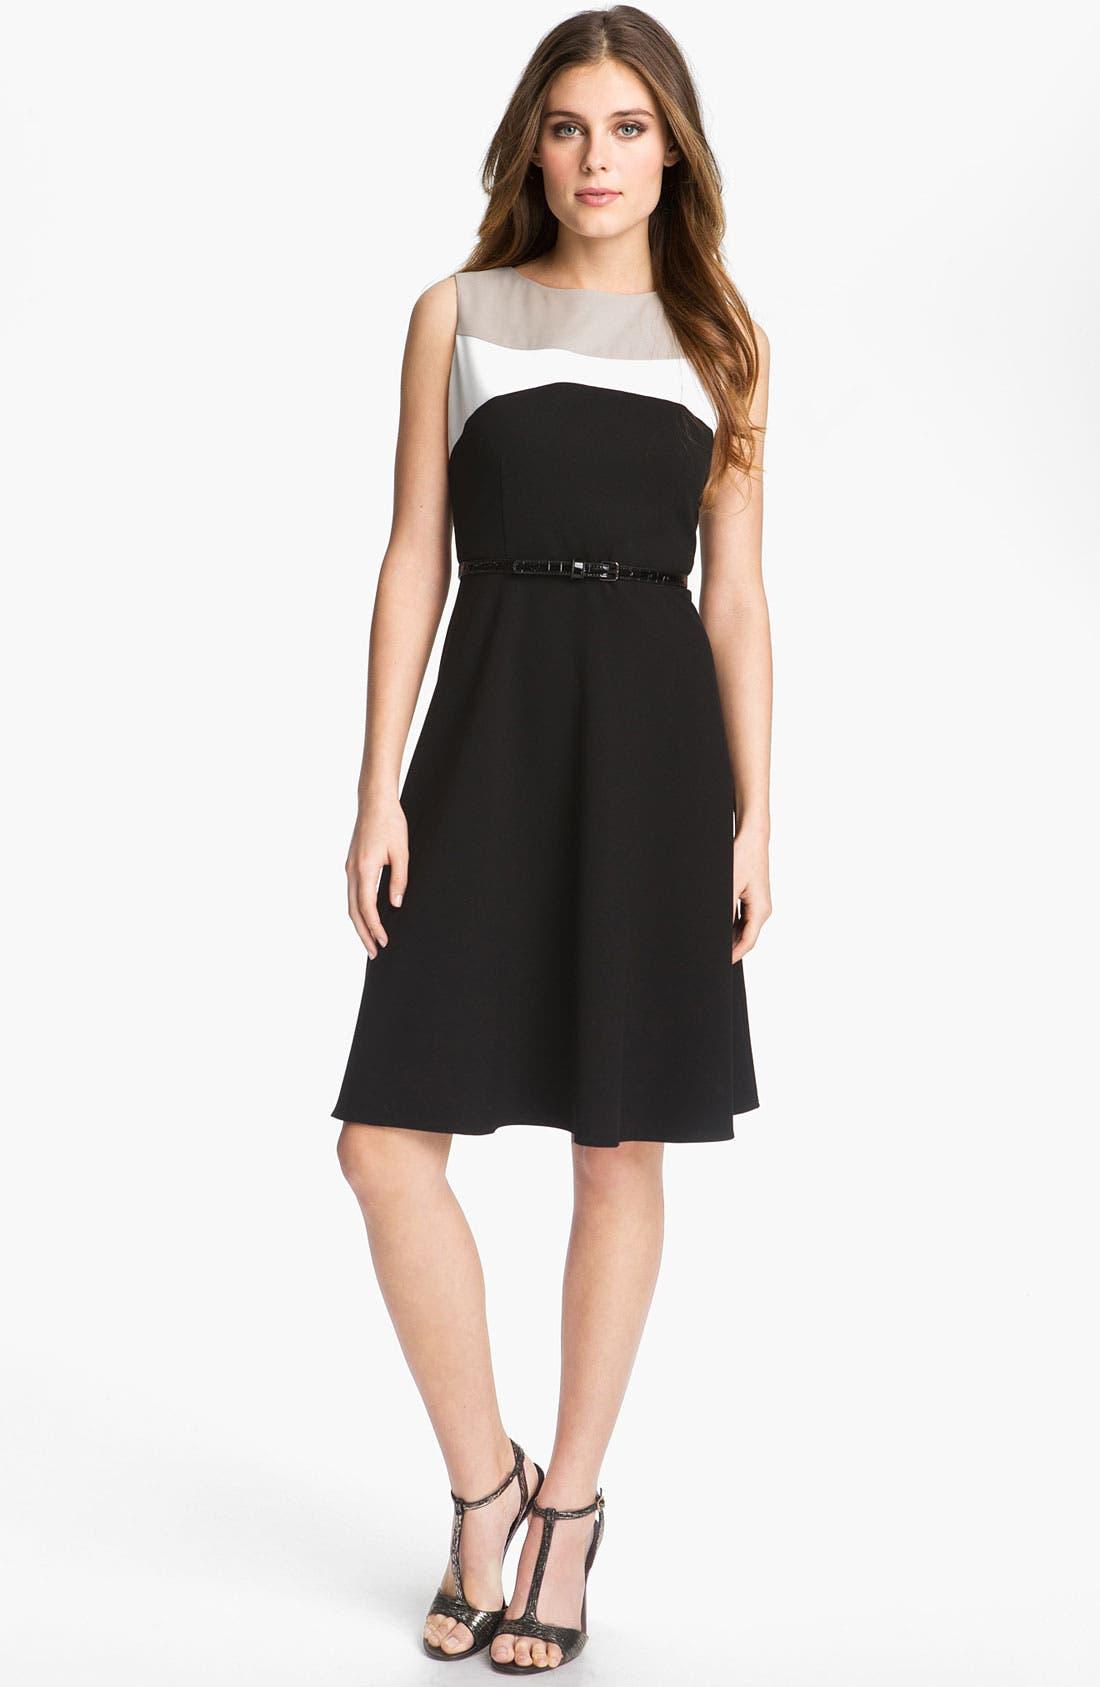 Alternate Image 1 Selected - Calvin Klein Colorblock Fit & Flare Dress